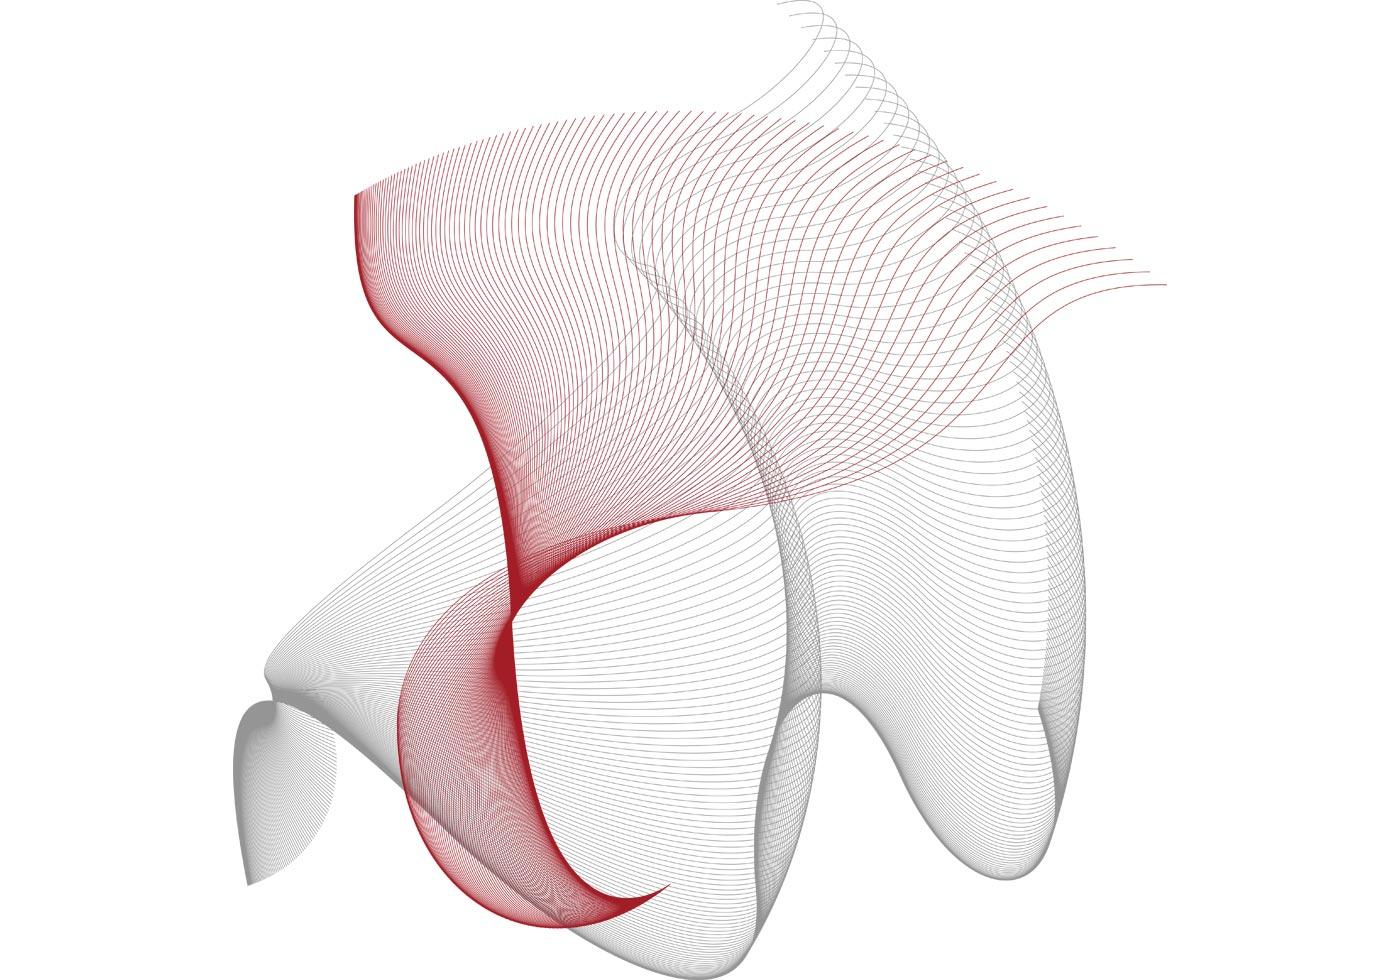 Line Art Design Free Download : Flowing curves free vector designs download